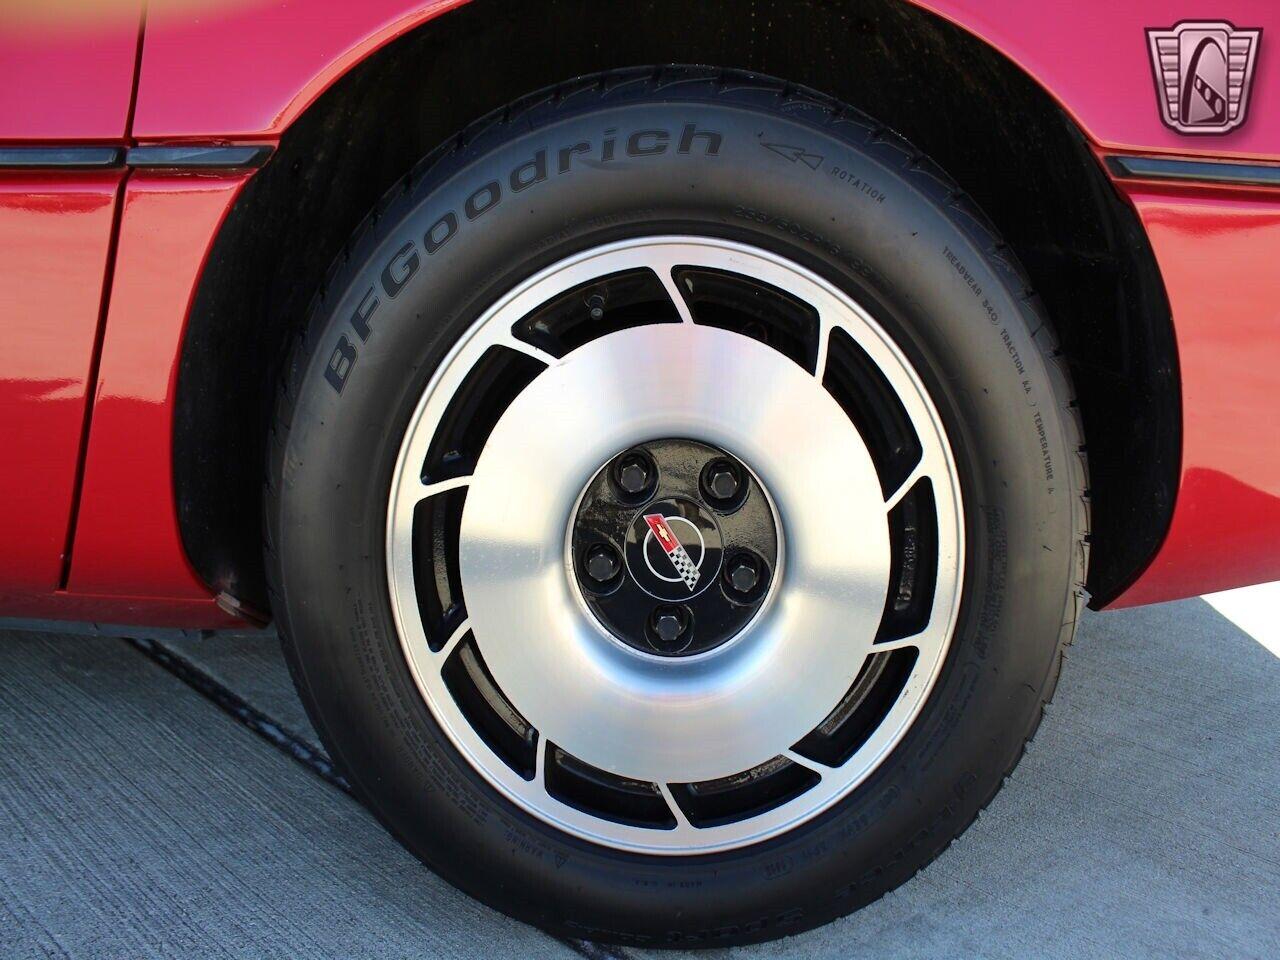 1984 Red Chevrolet Corvette     C4 Corvette Photo 10